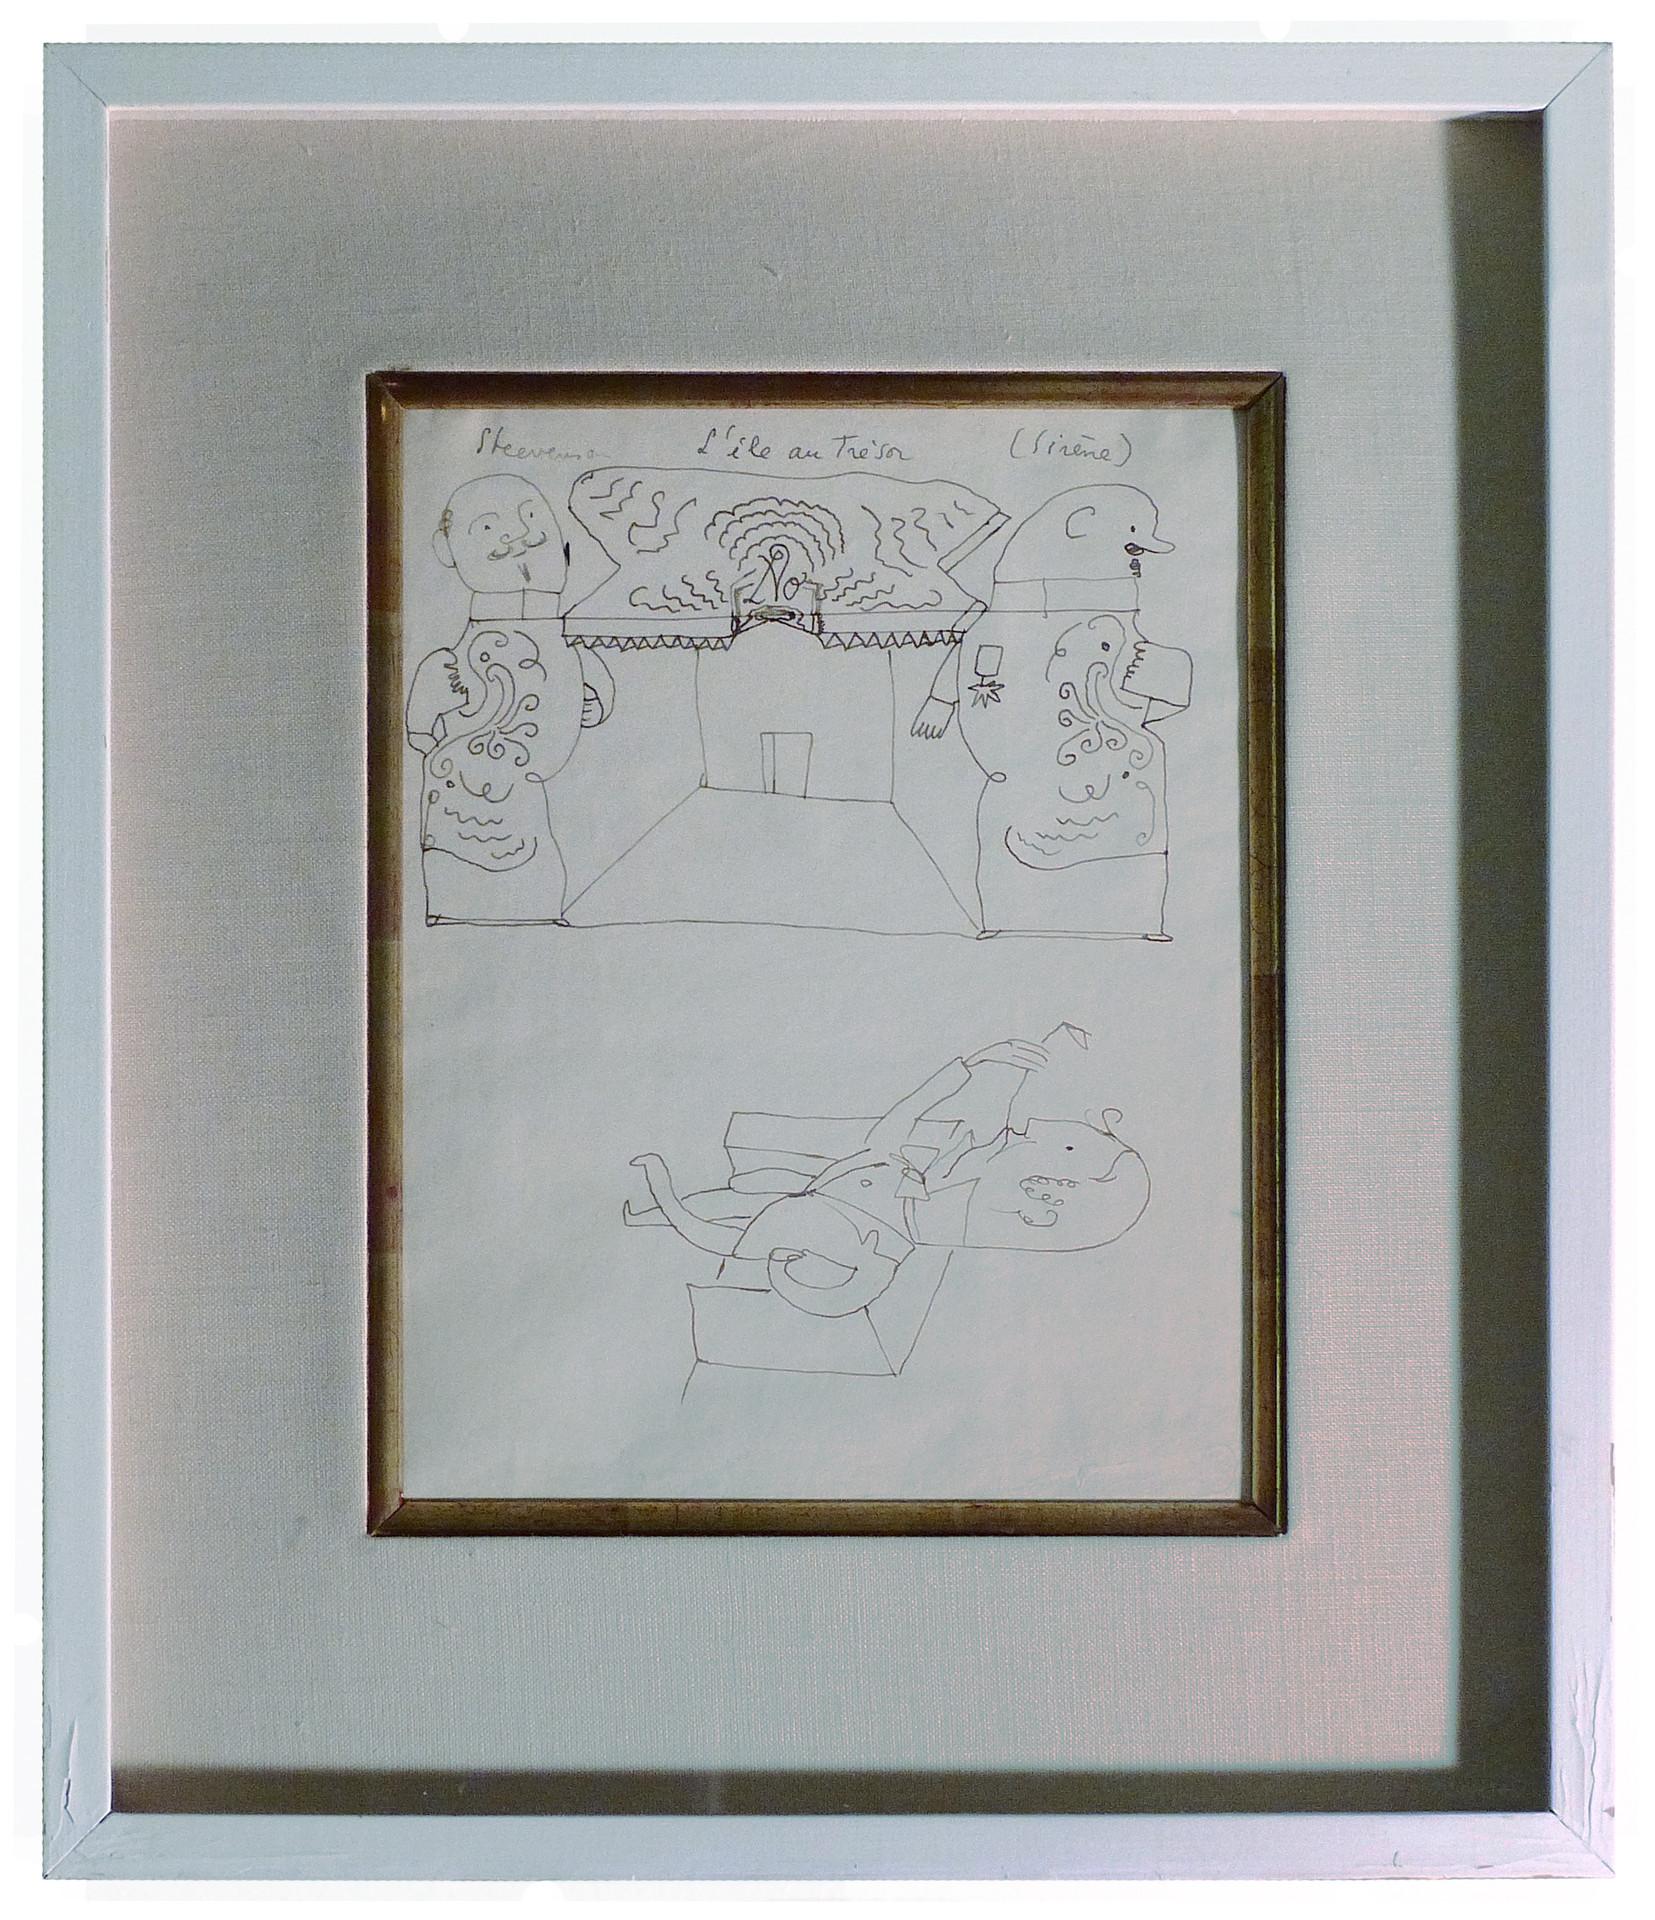 L'ile Au Tre'sor Graphite on paper 9 x 12 in. Hand-signed